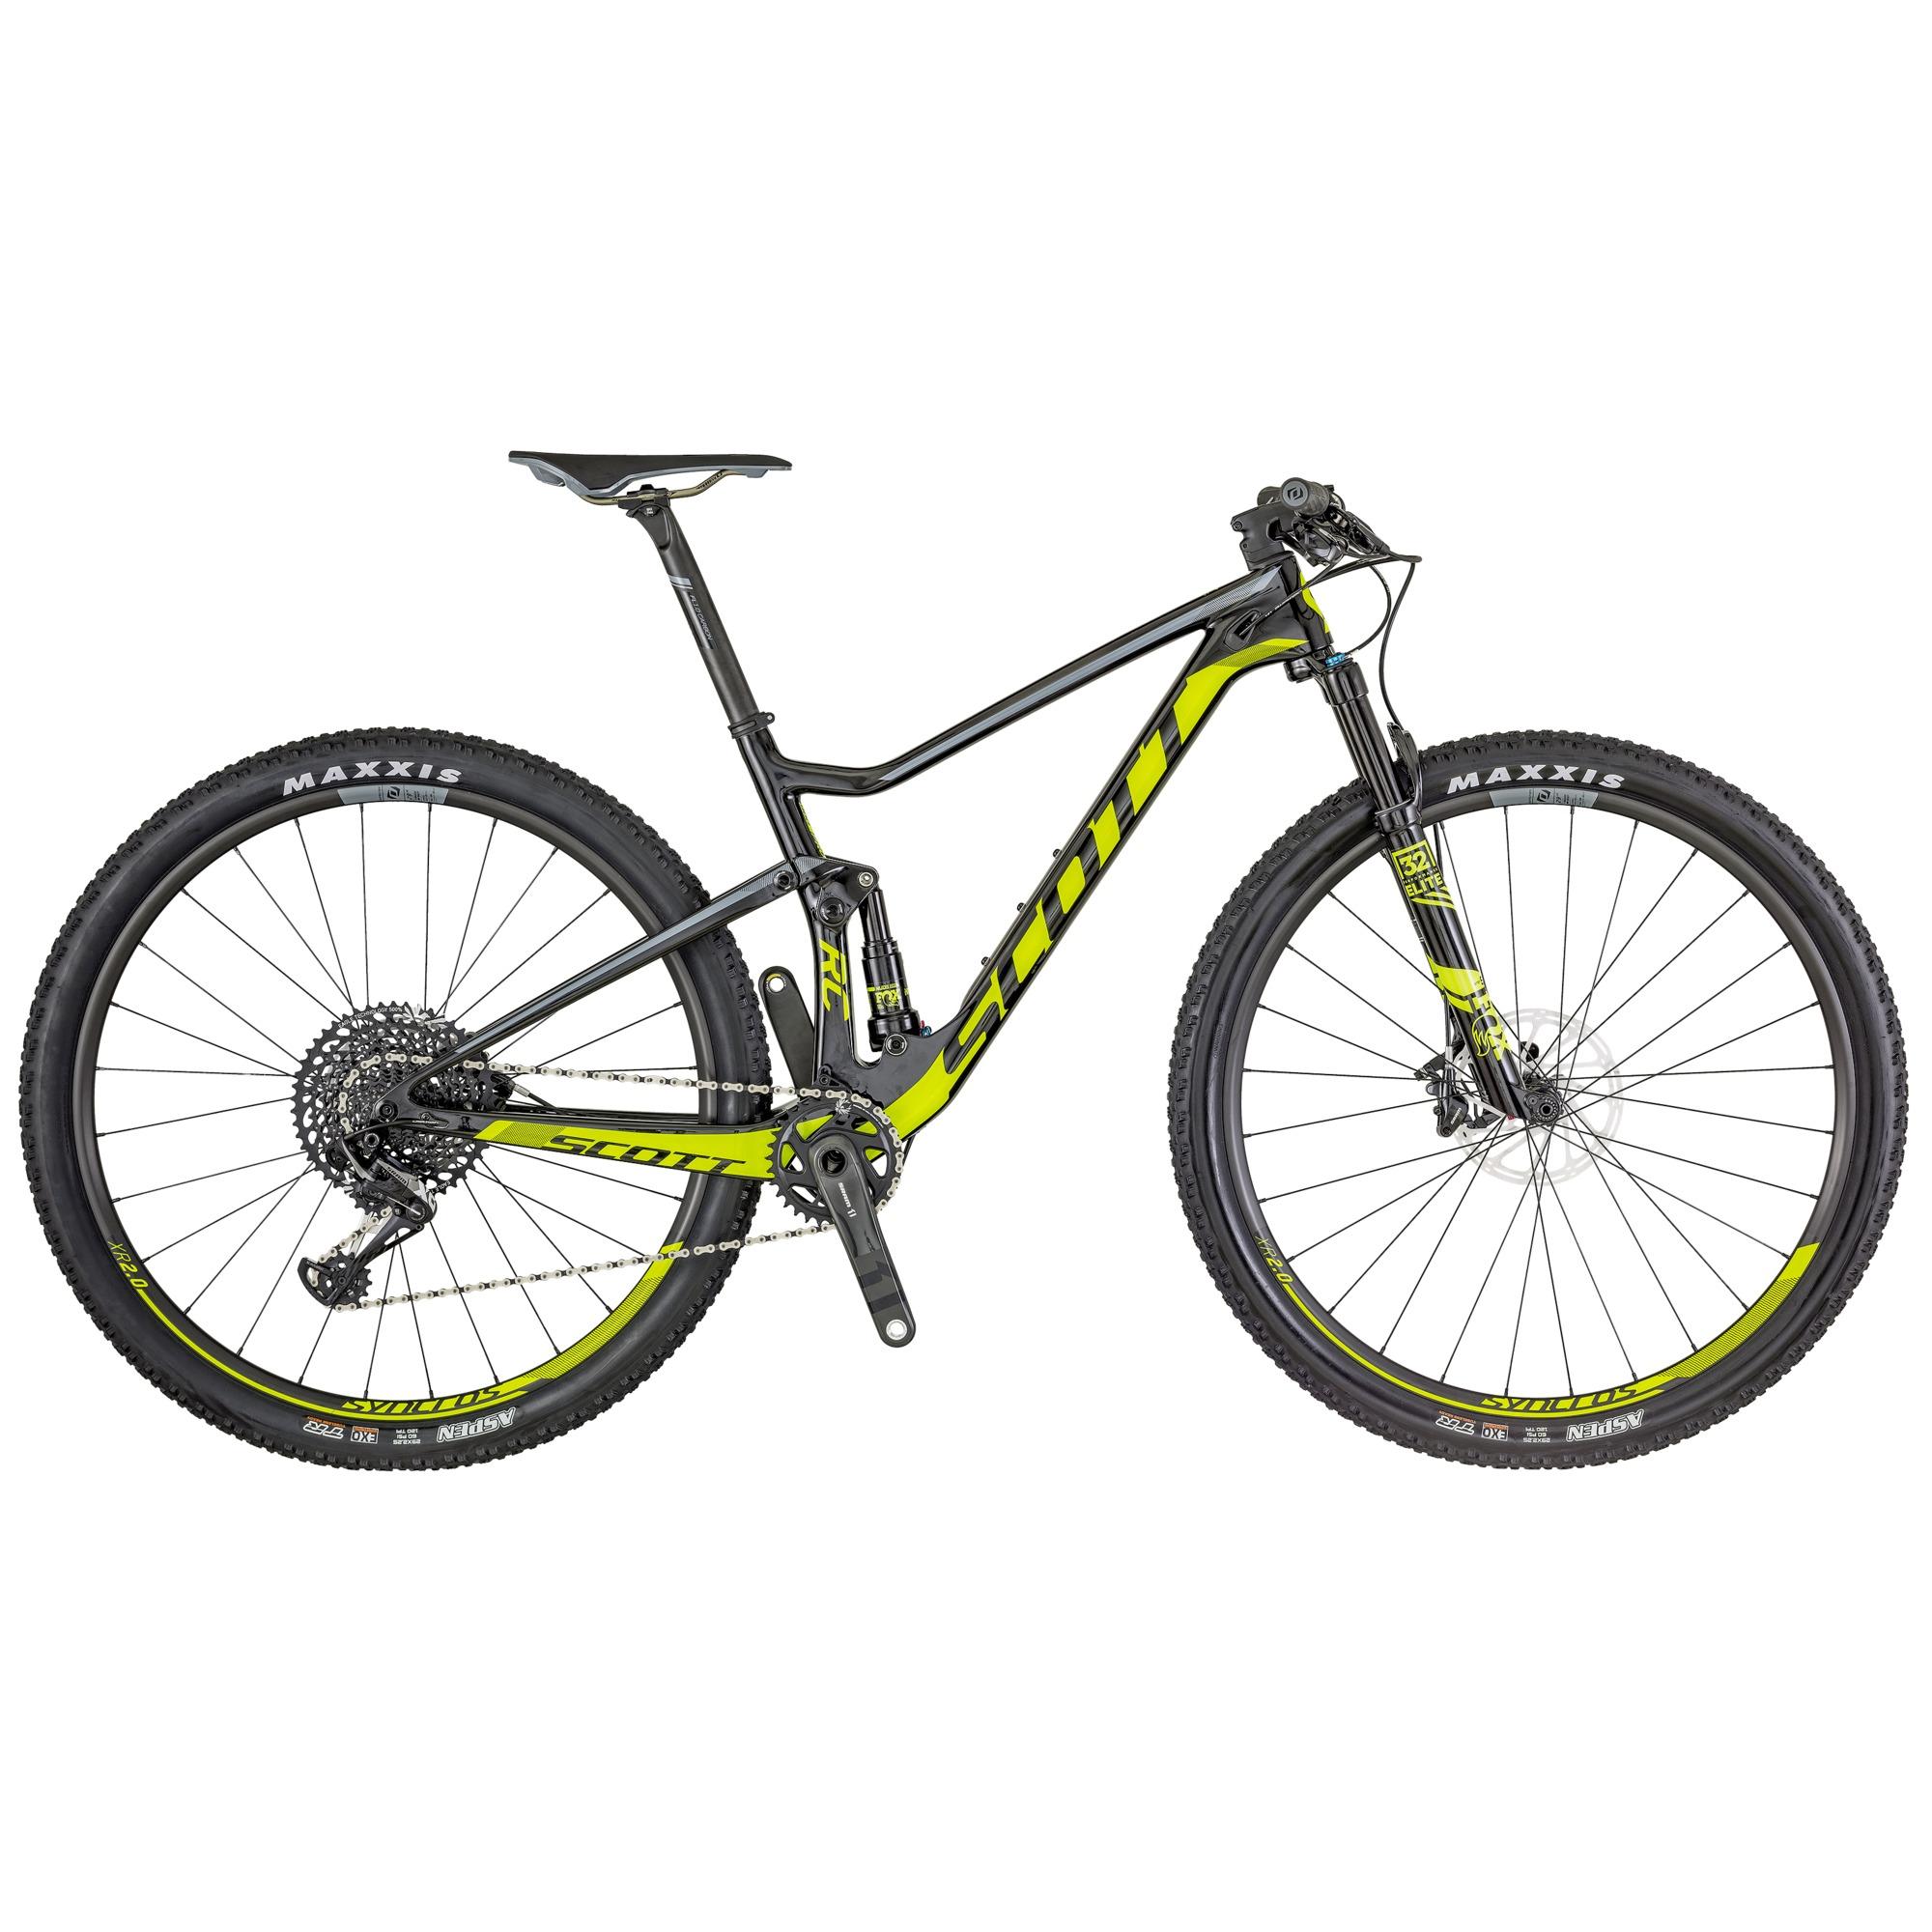 SCOTT Spark RC 900 Pro Bike L - Zweirad Homann